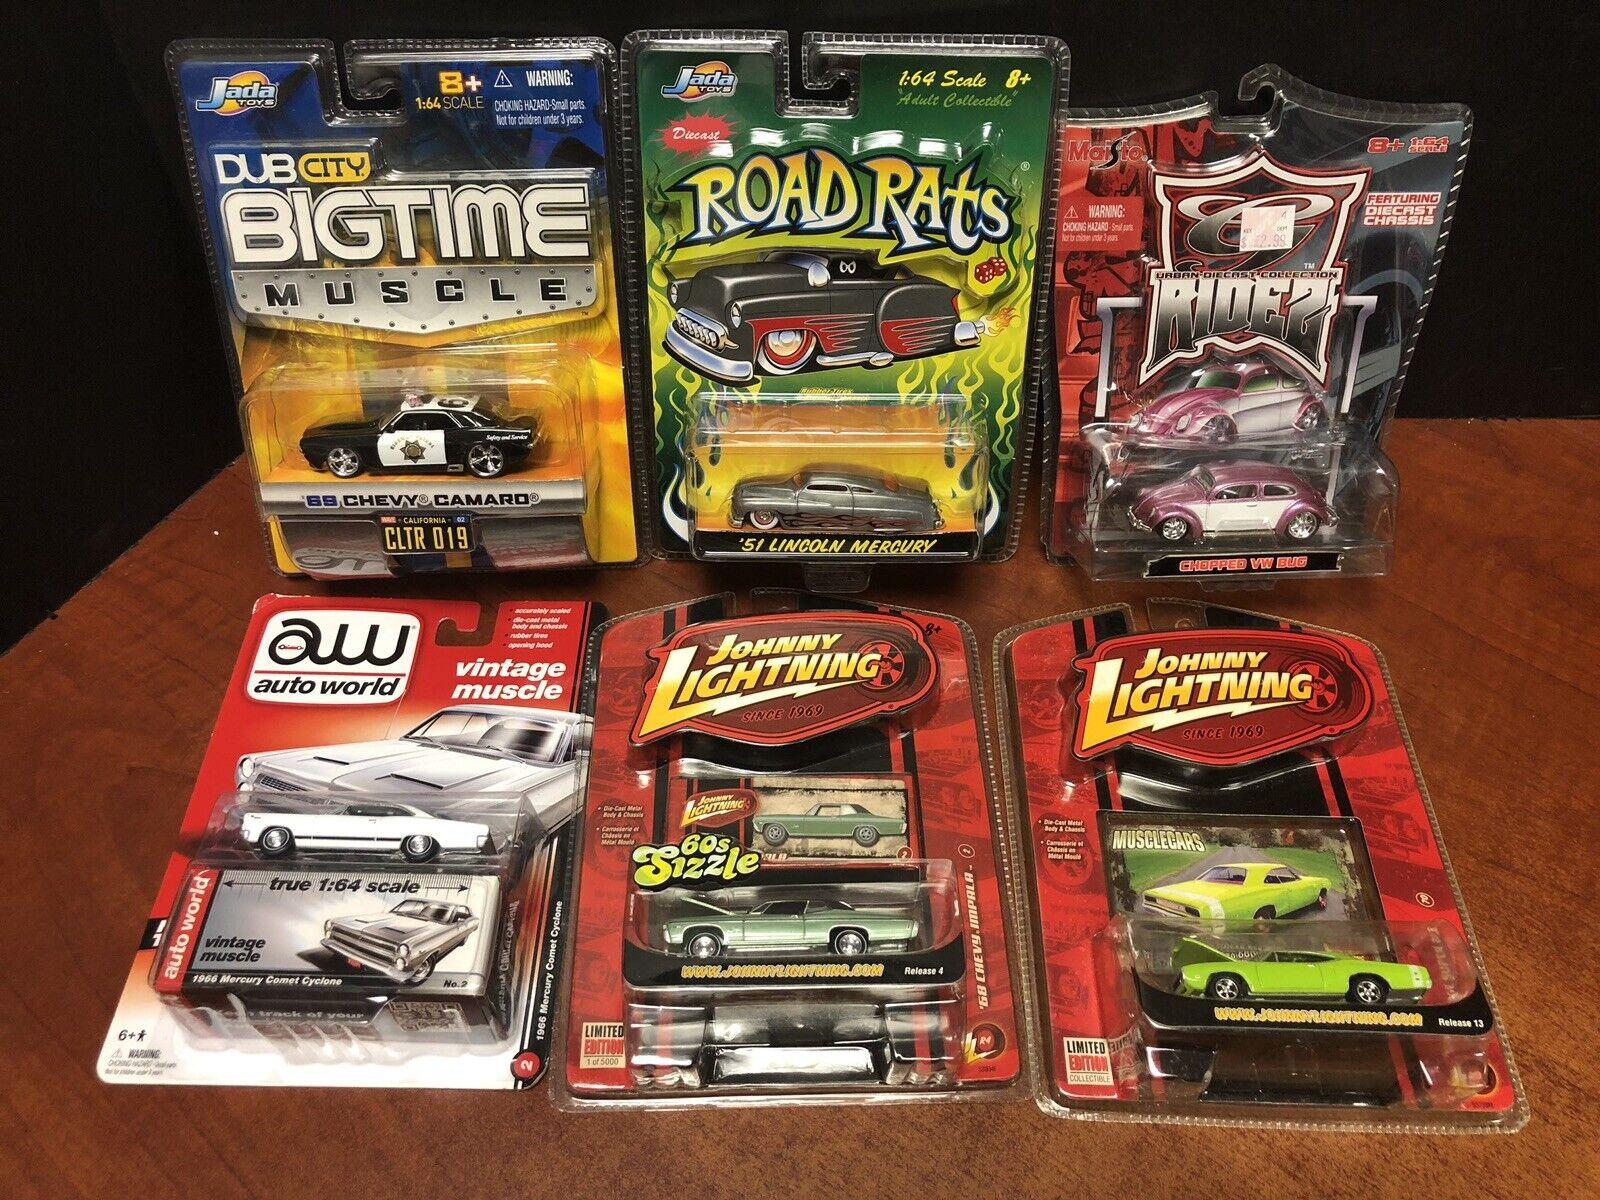 Assorted Diecast Jada Johnny Lightning Maisto Impala Bug Camaro Lot Of 6 EM3363